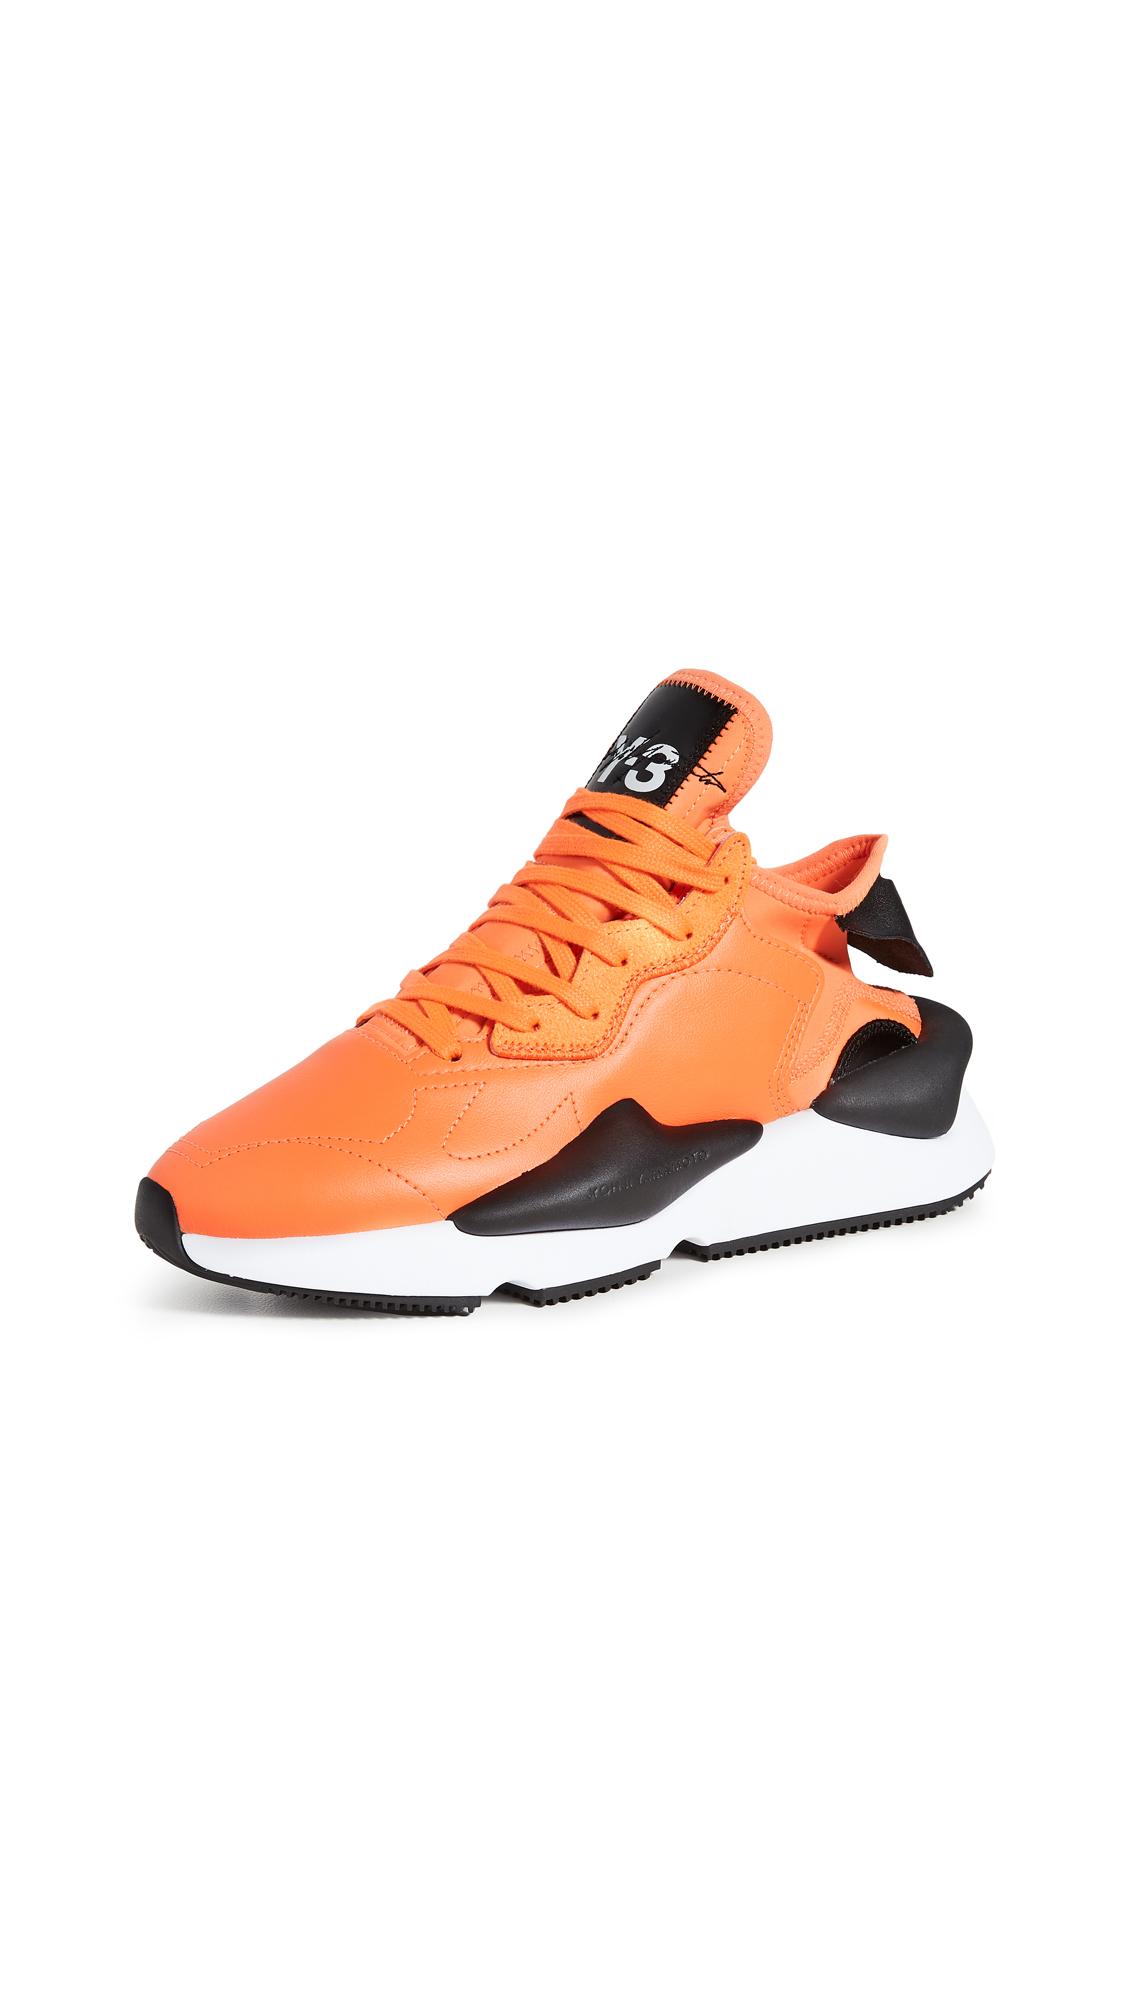 Buy Y-3 Y-3 Kaiwa Sneakers online, shop Y-3